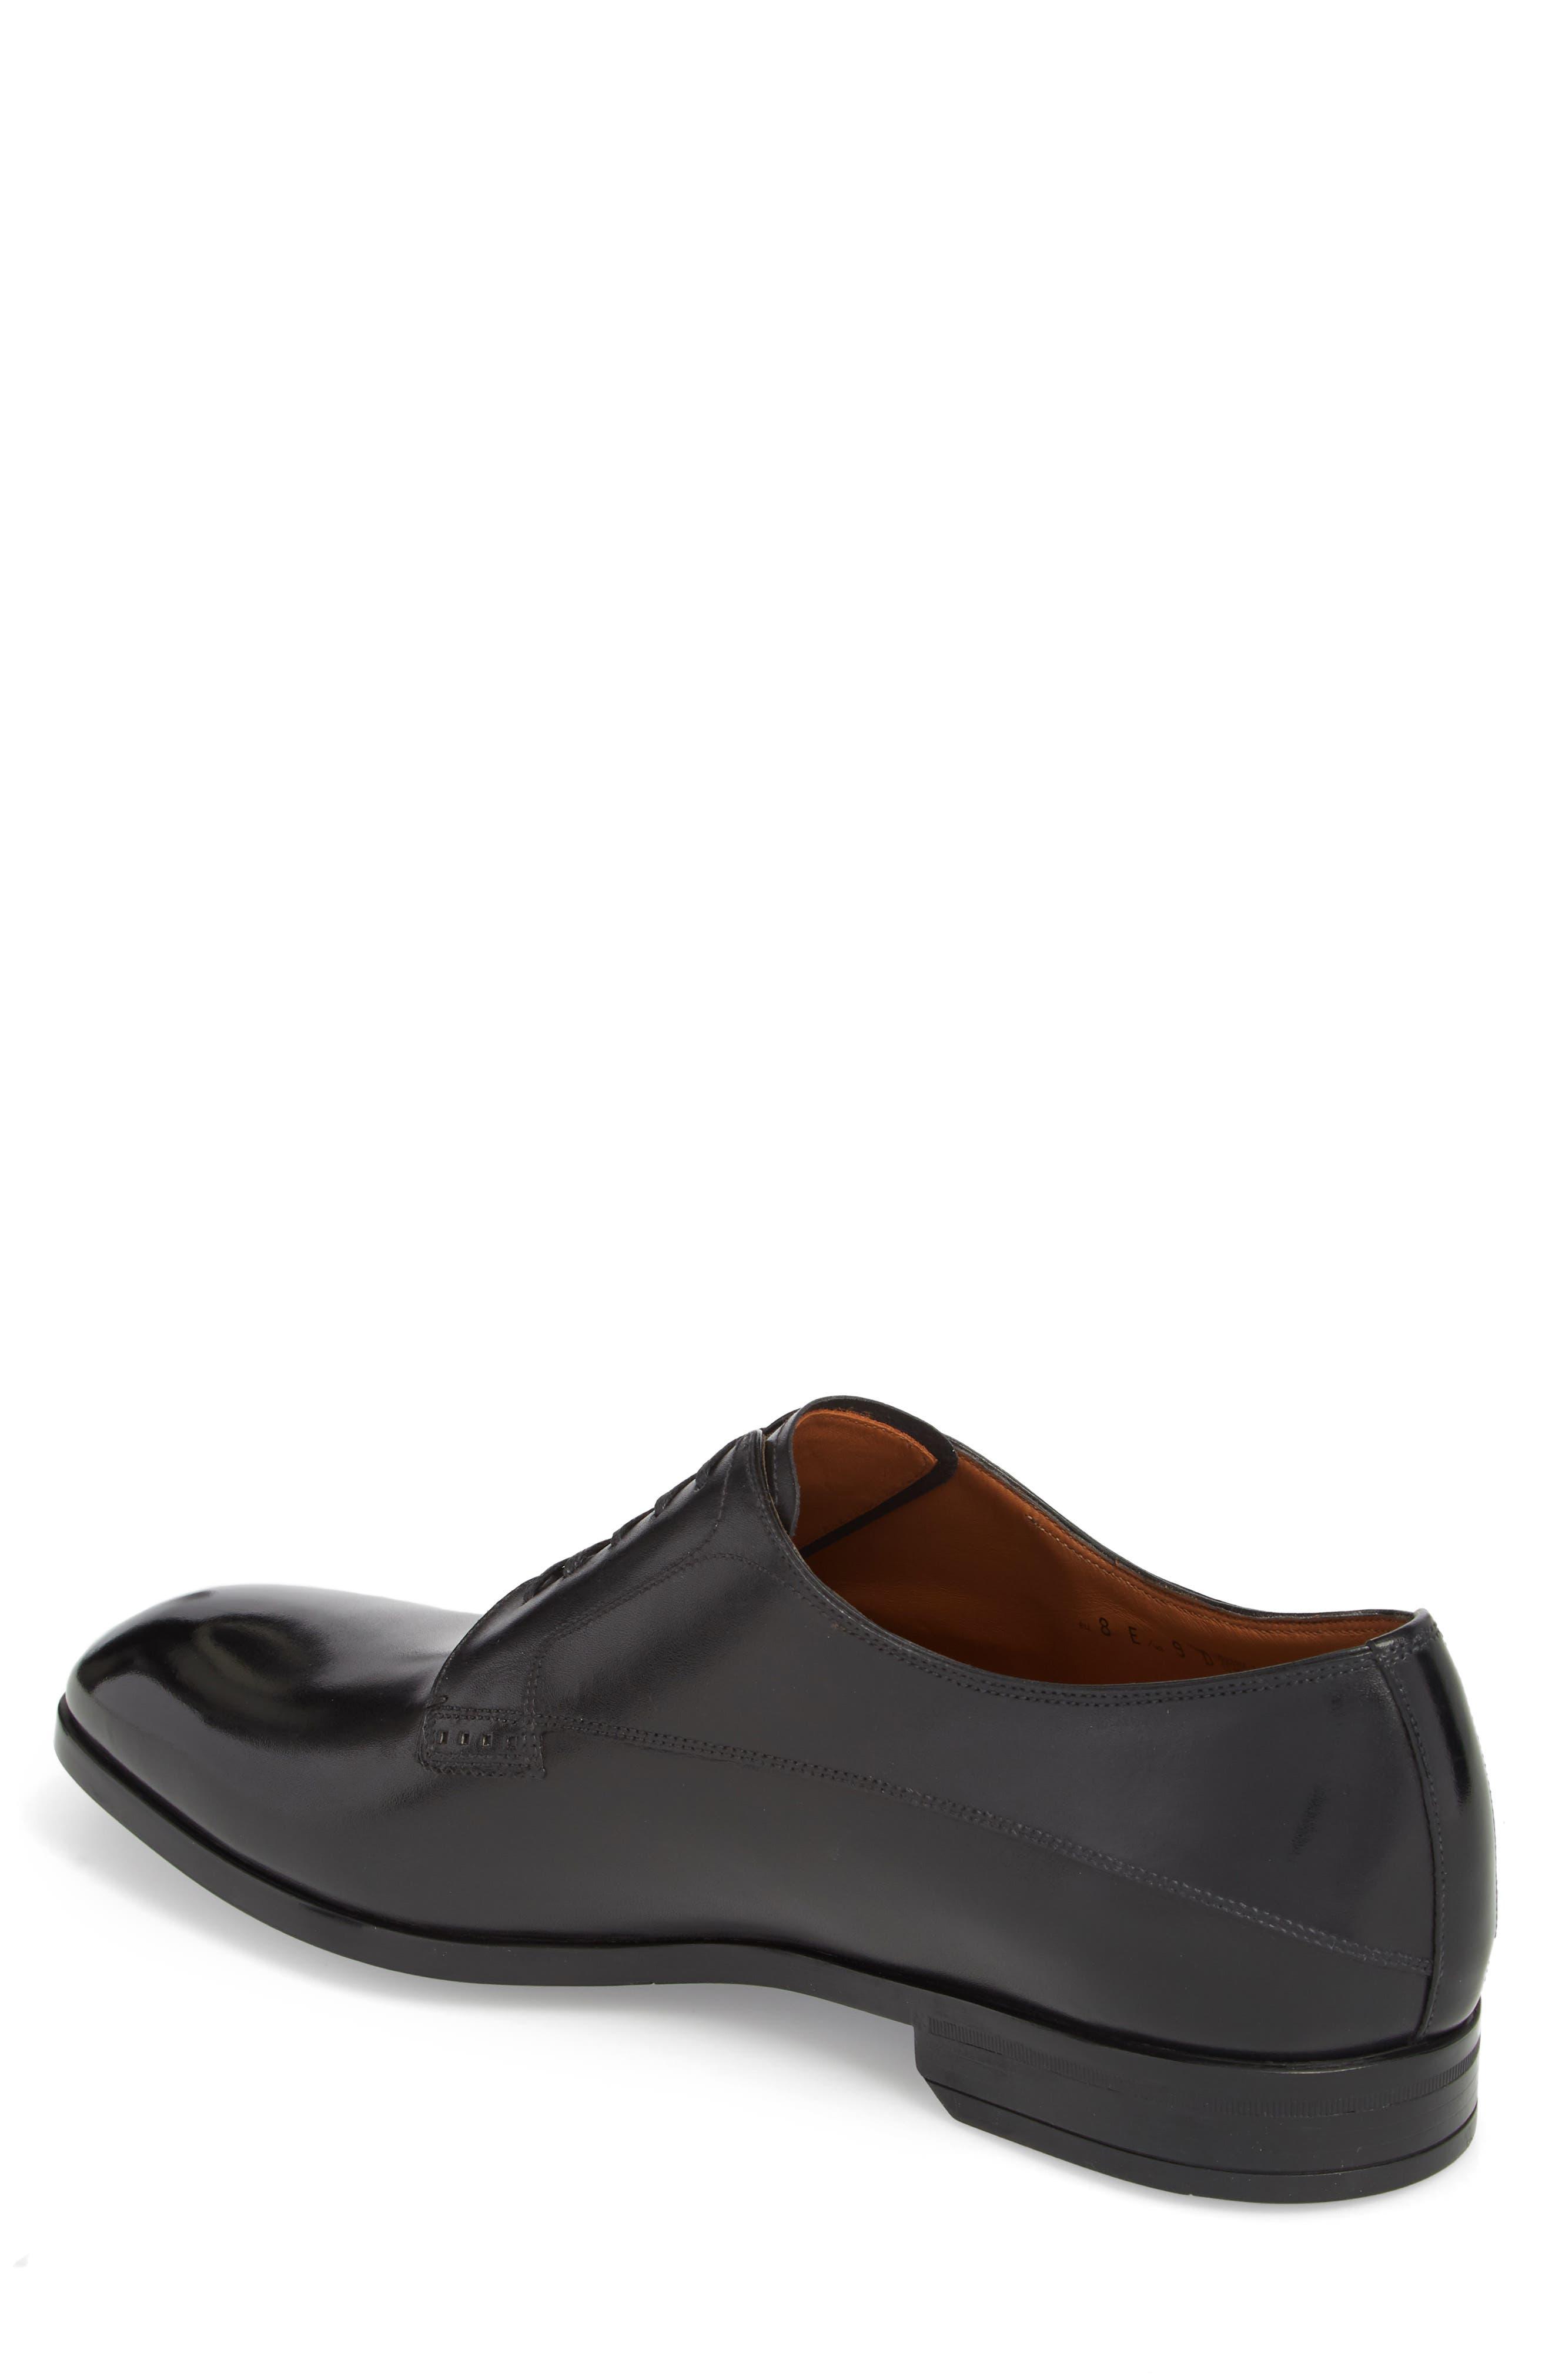 Lantel Plain Toe Derby,                             Alternate thumbnail 2, color,                             BLACK